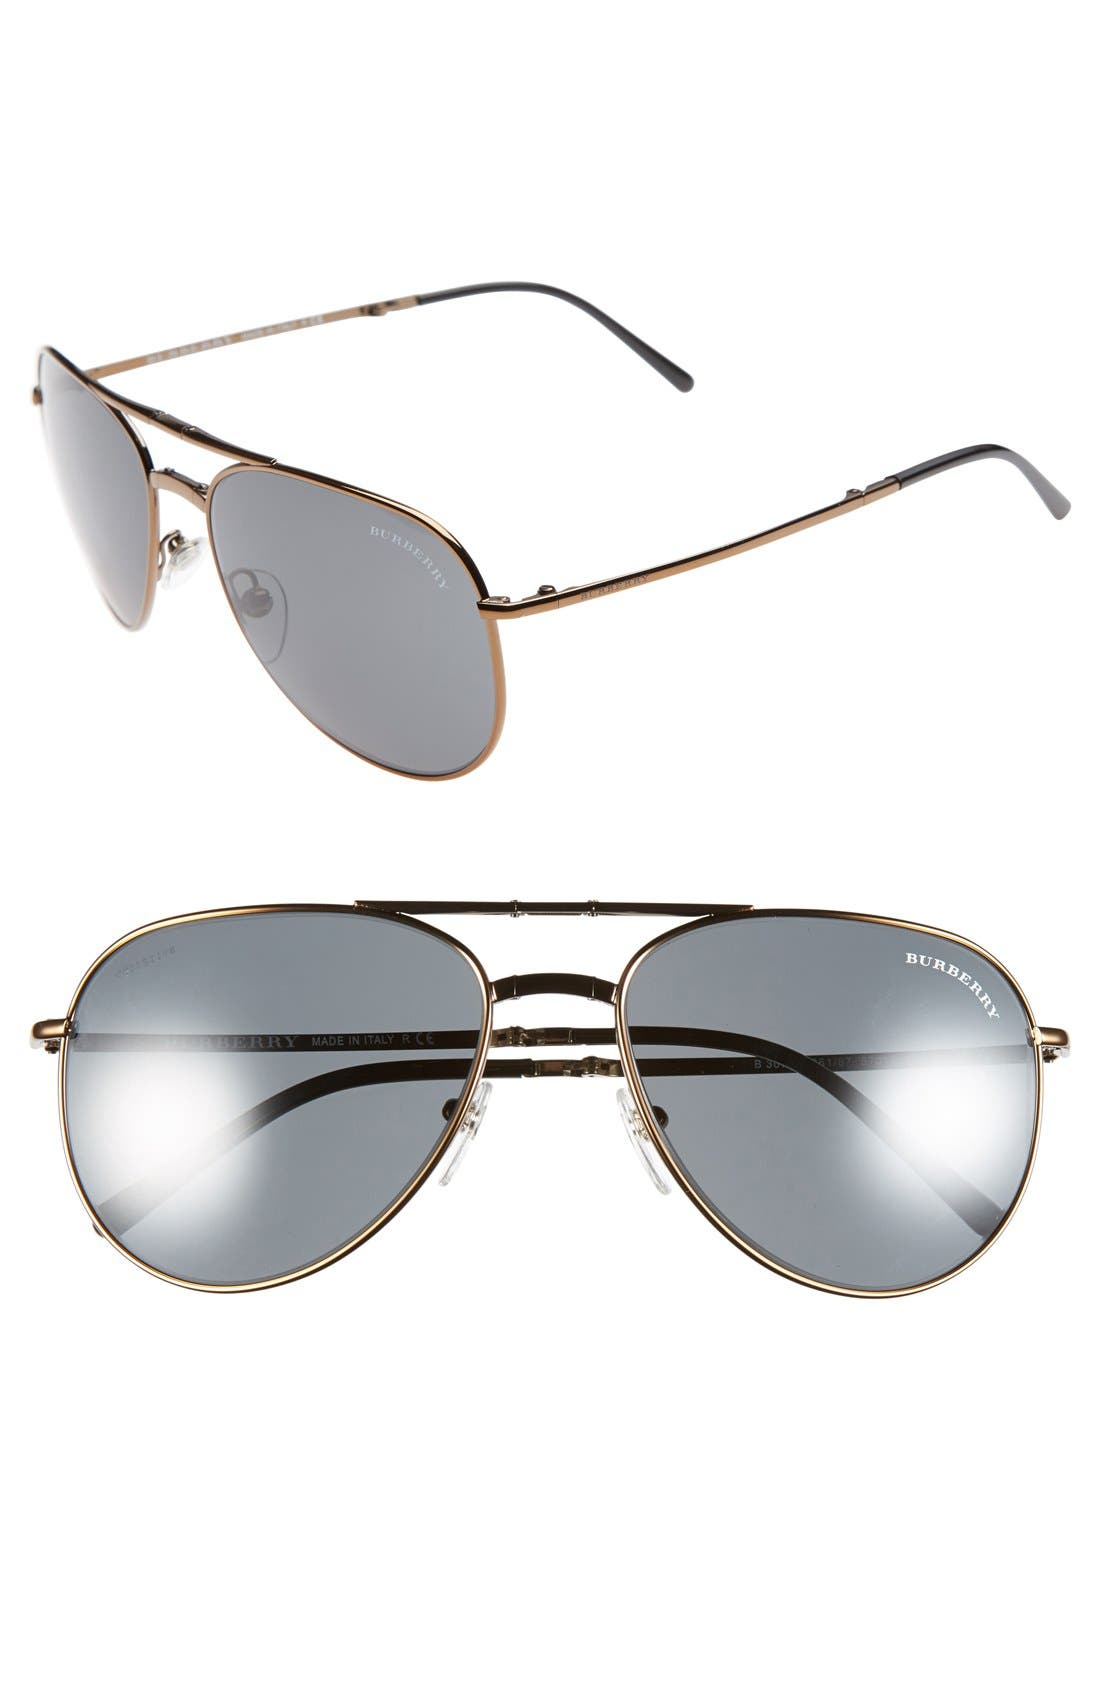 Main Image - Burberry 'Splash' 57mm Foldable Aviator Sunglasses